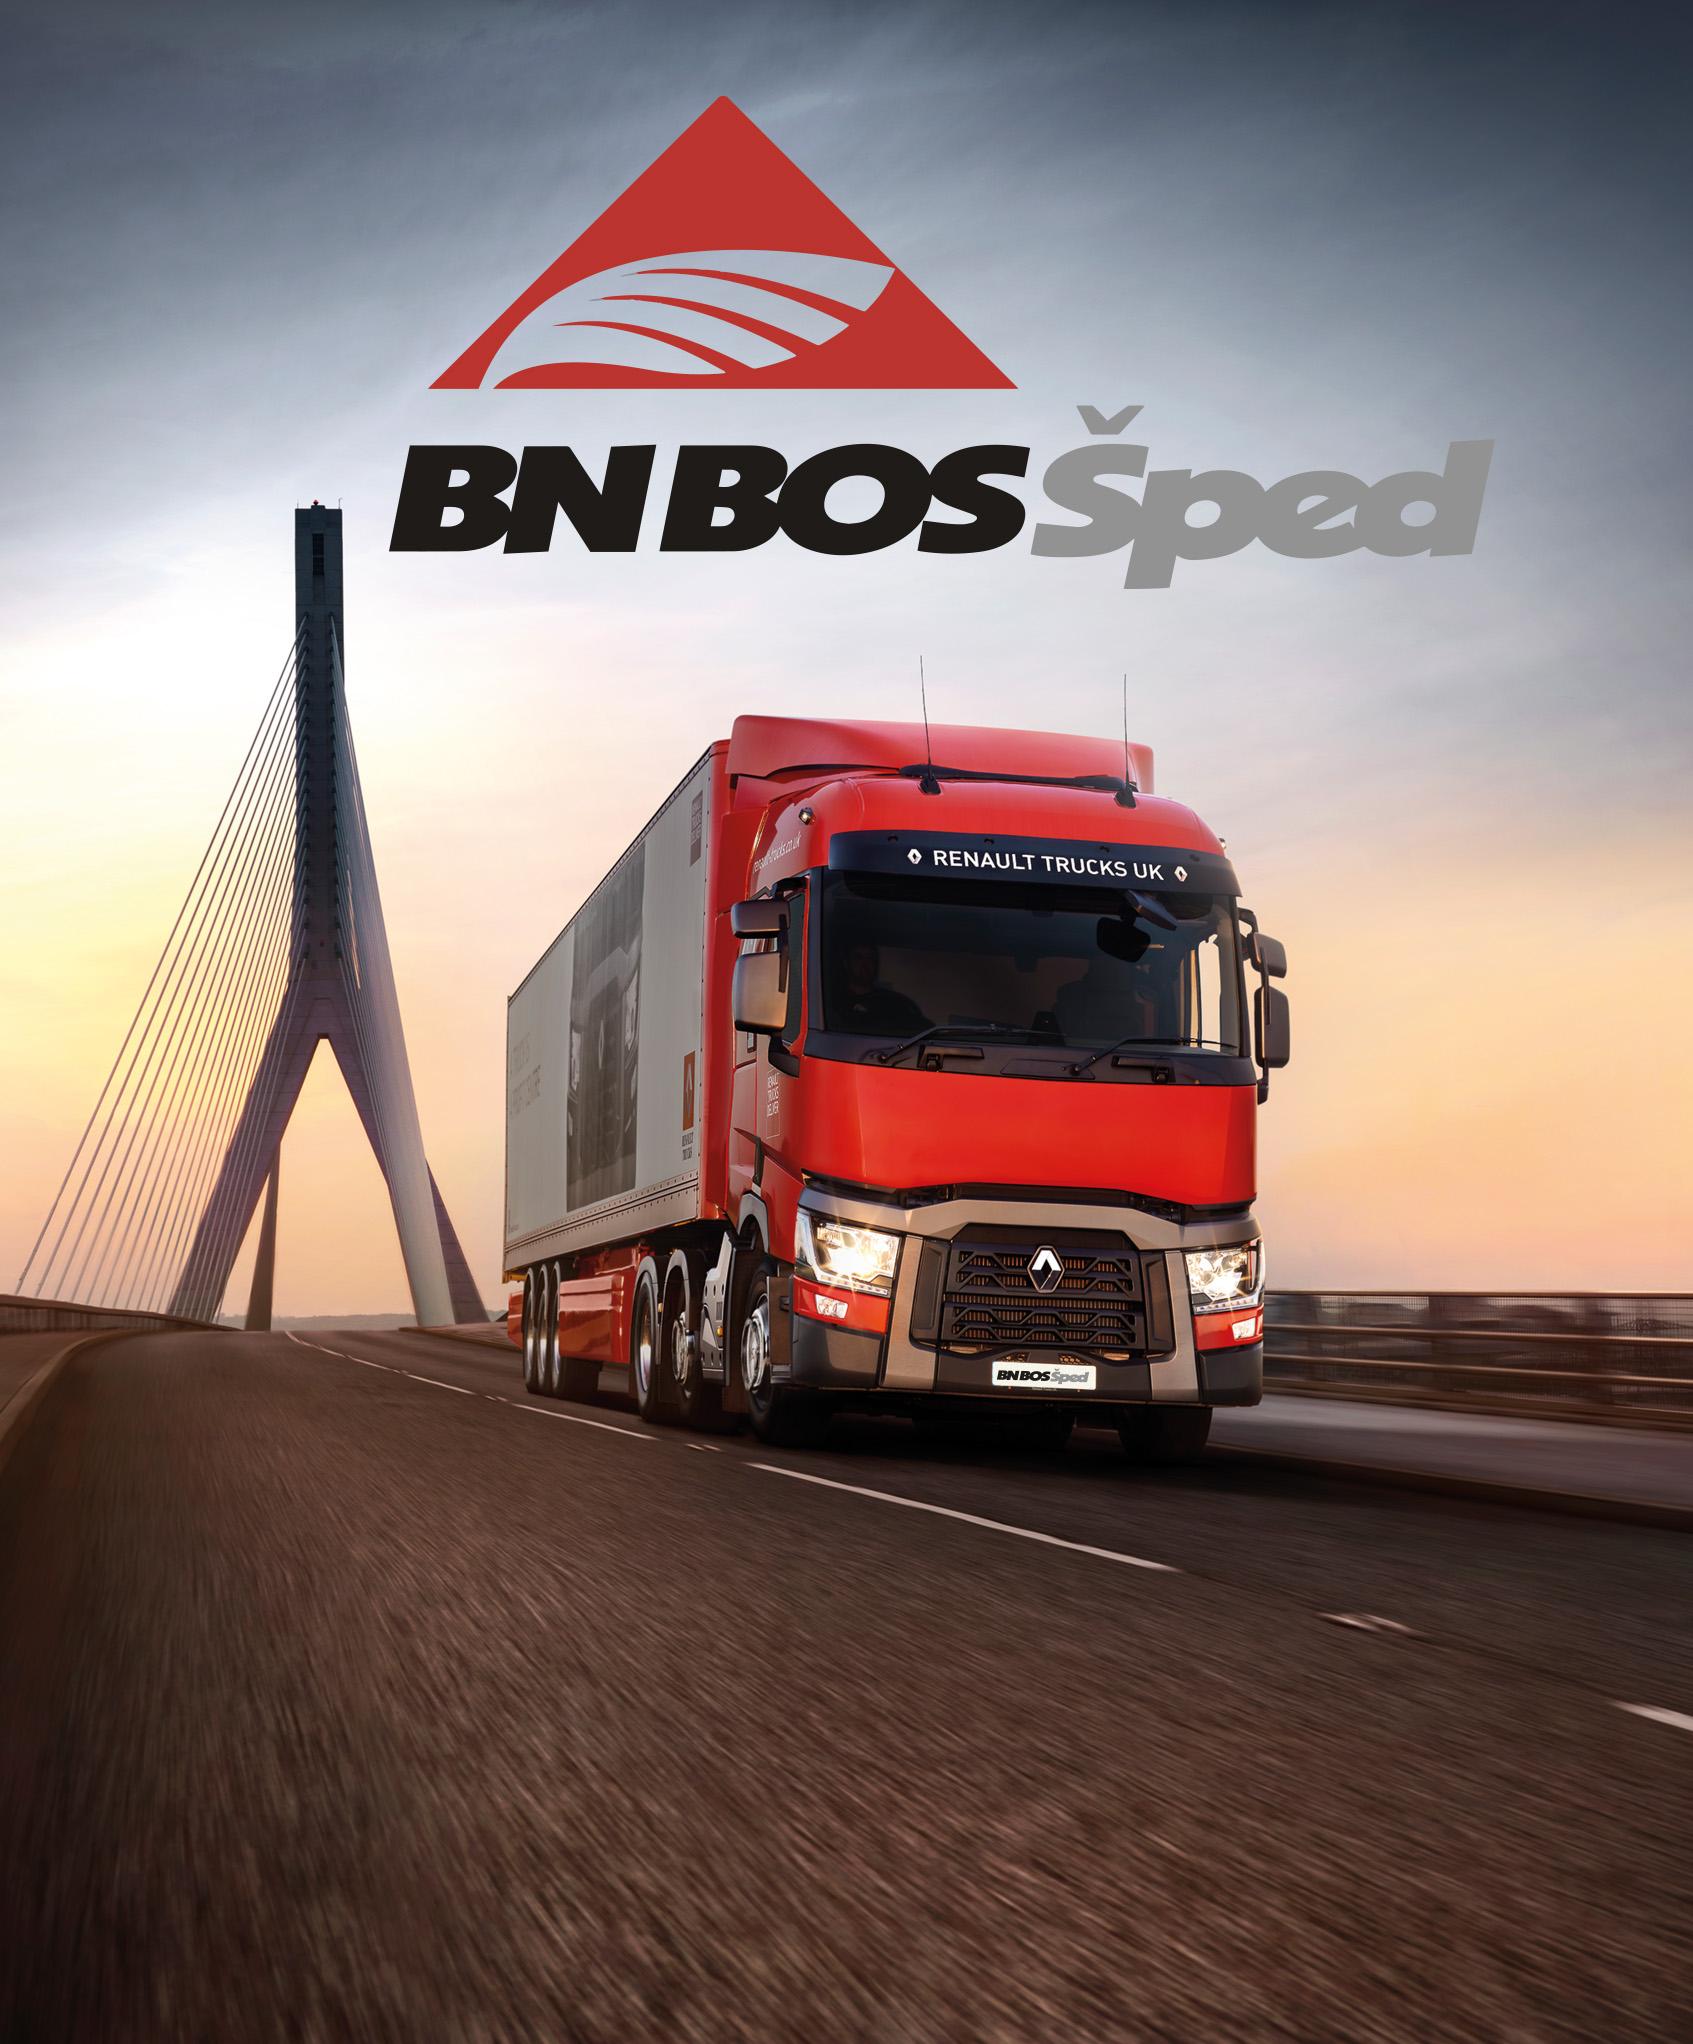 bnbossped1